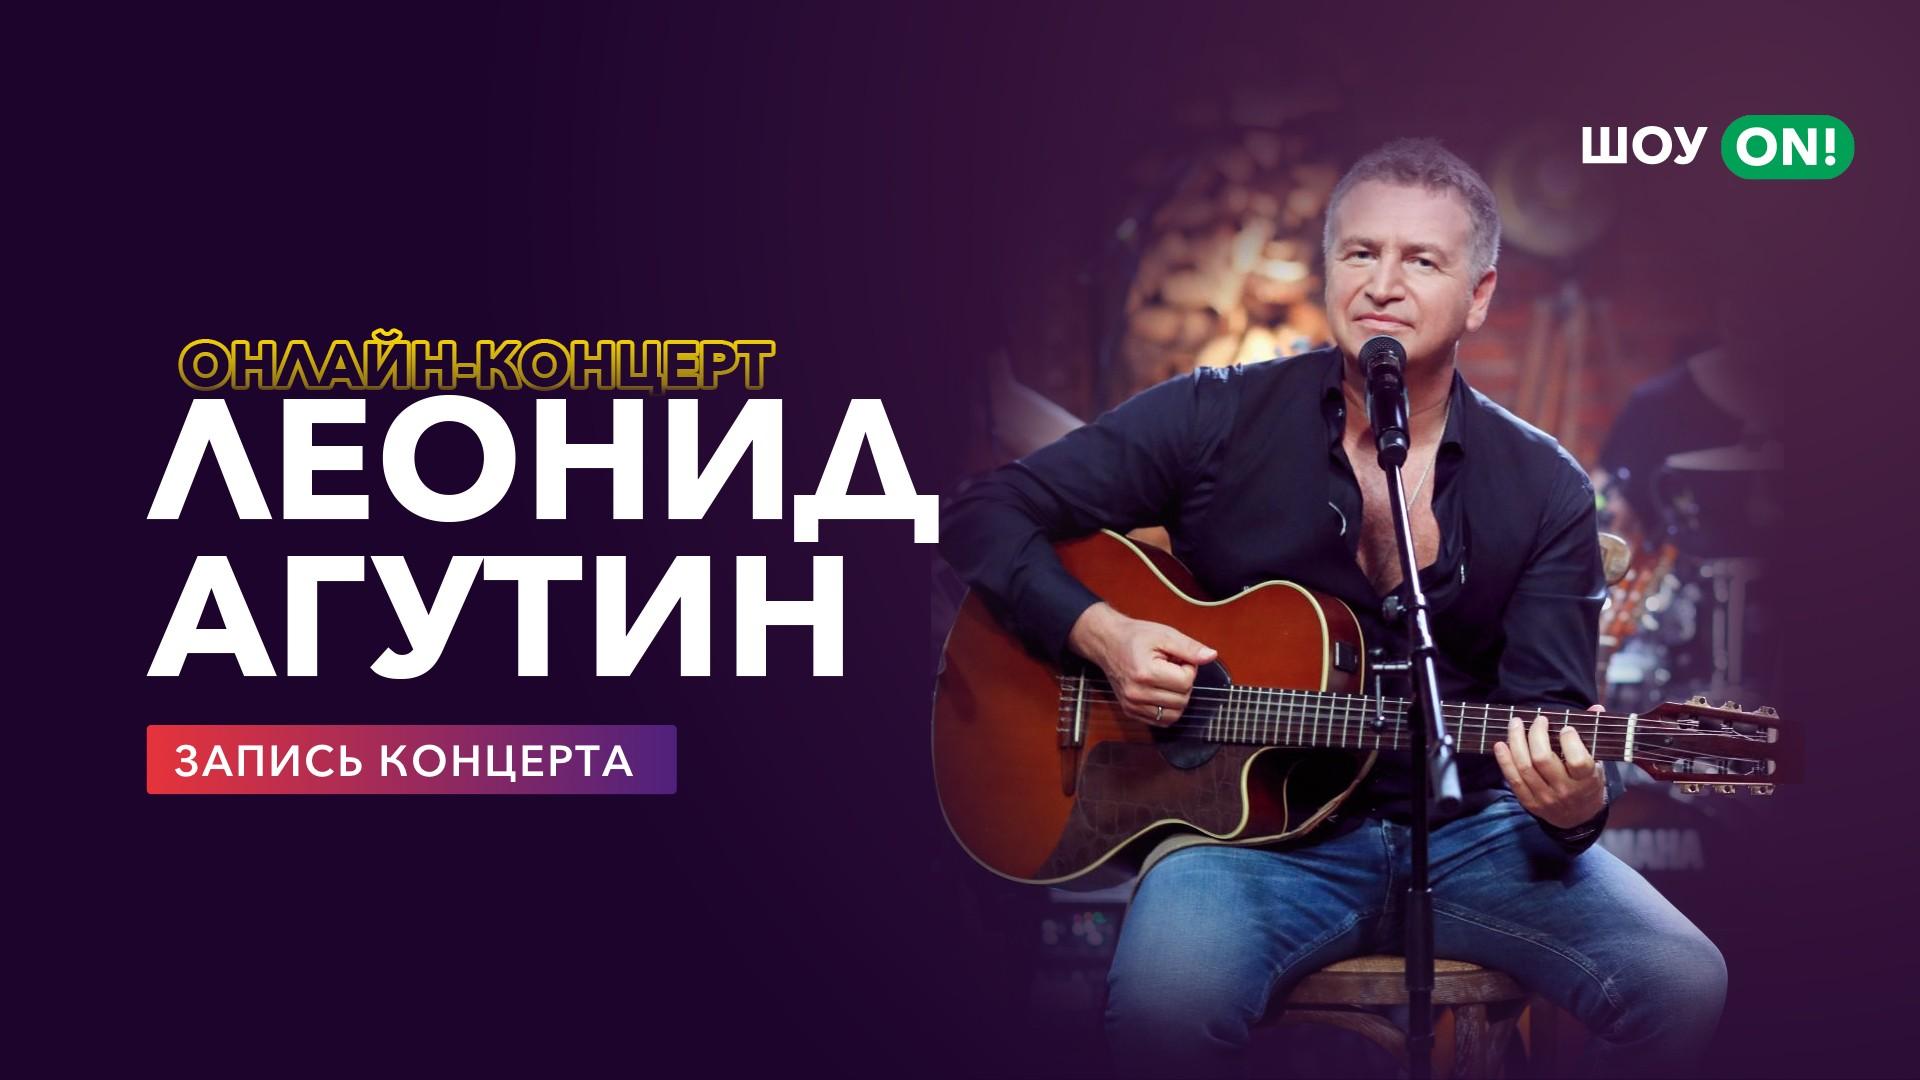 Леонид Агутин: Онлайн-концерт